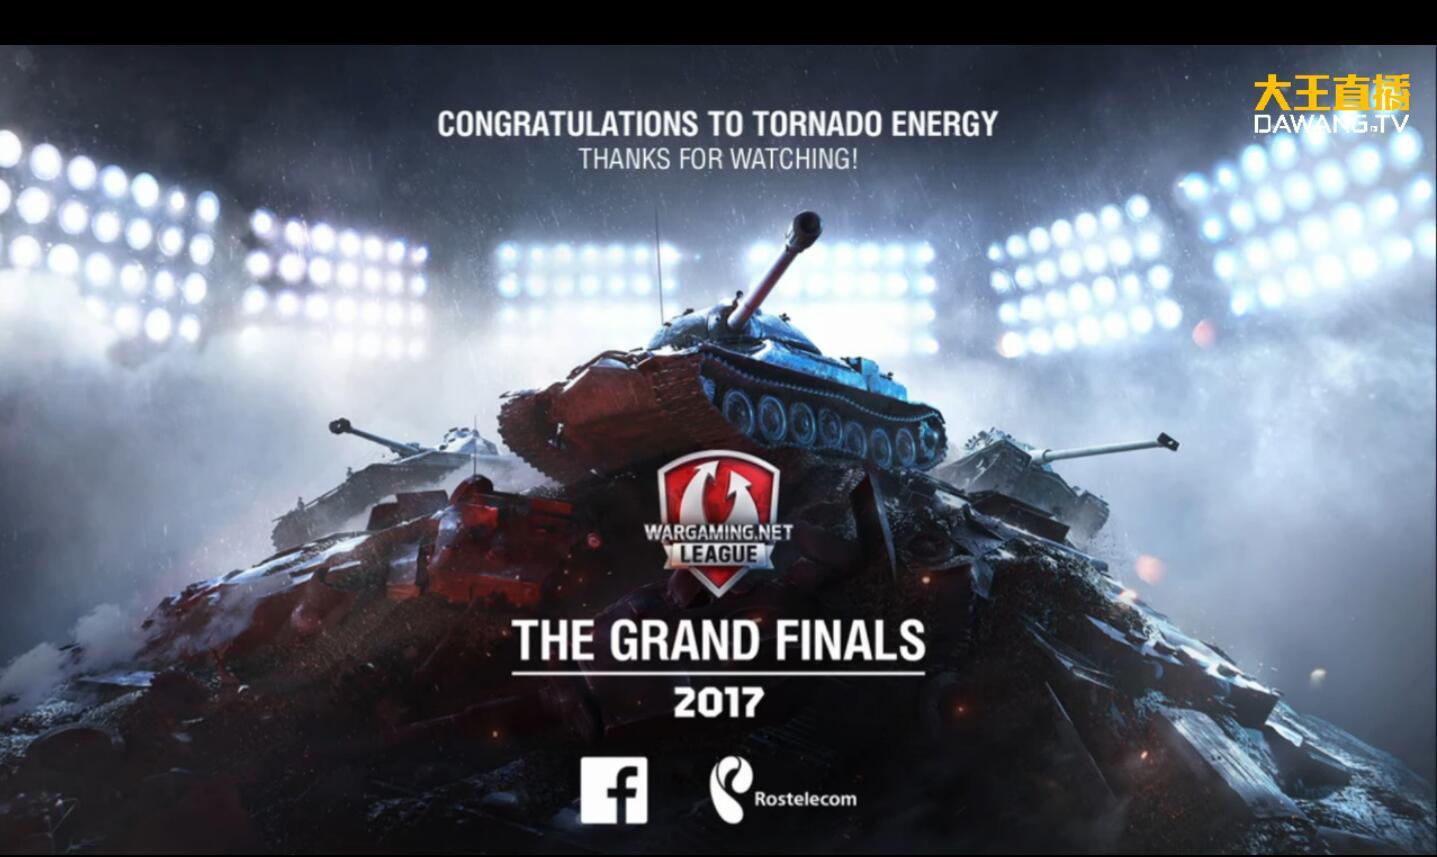 恭喜Tornado Energy夺冠